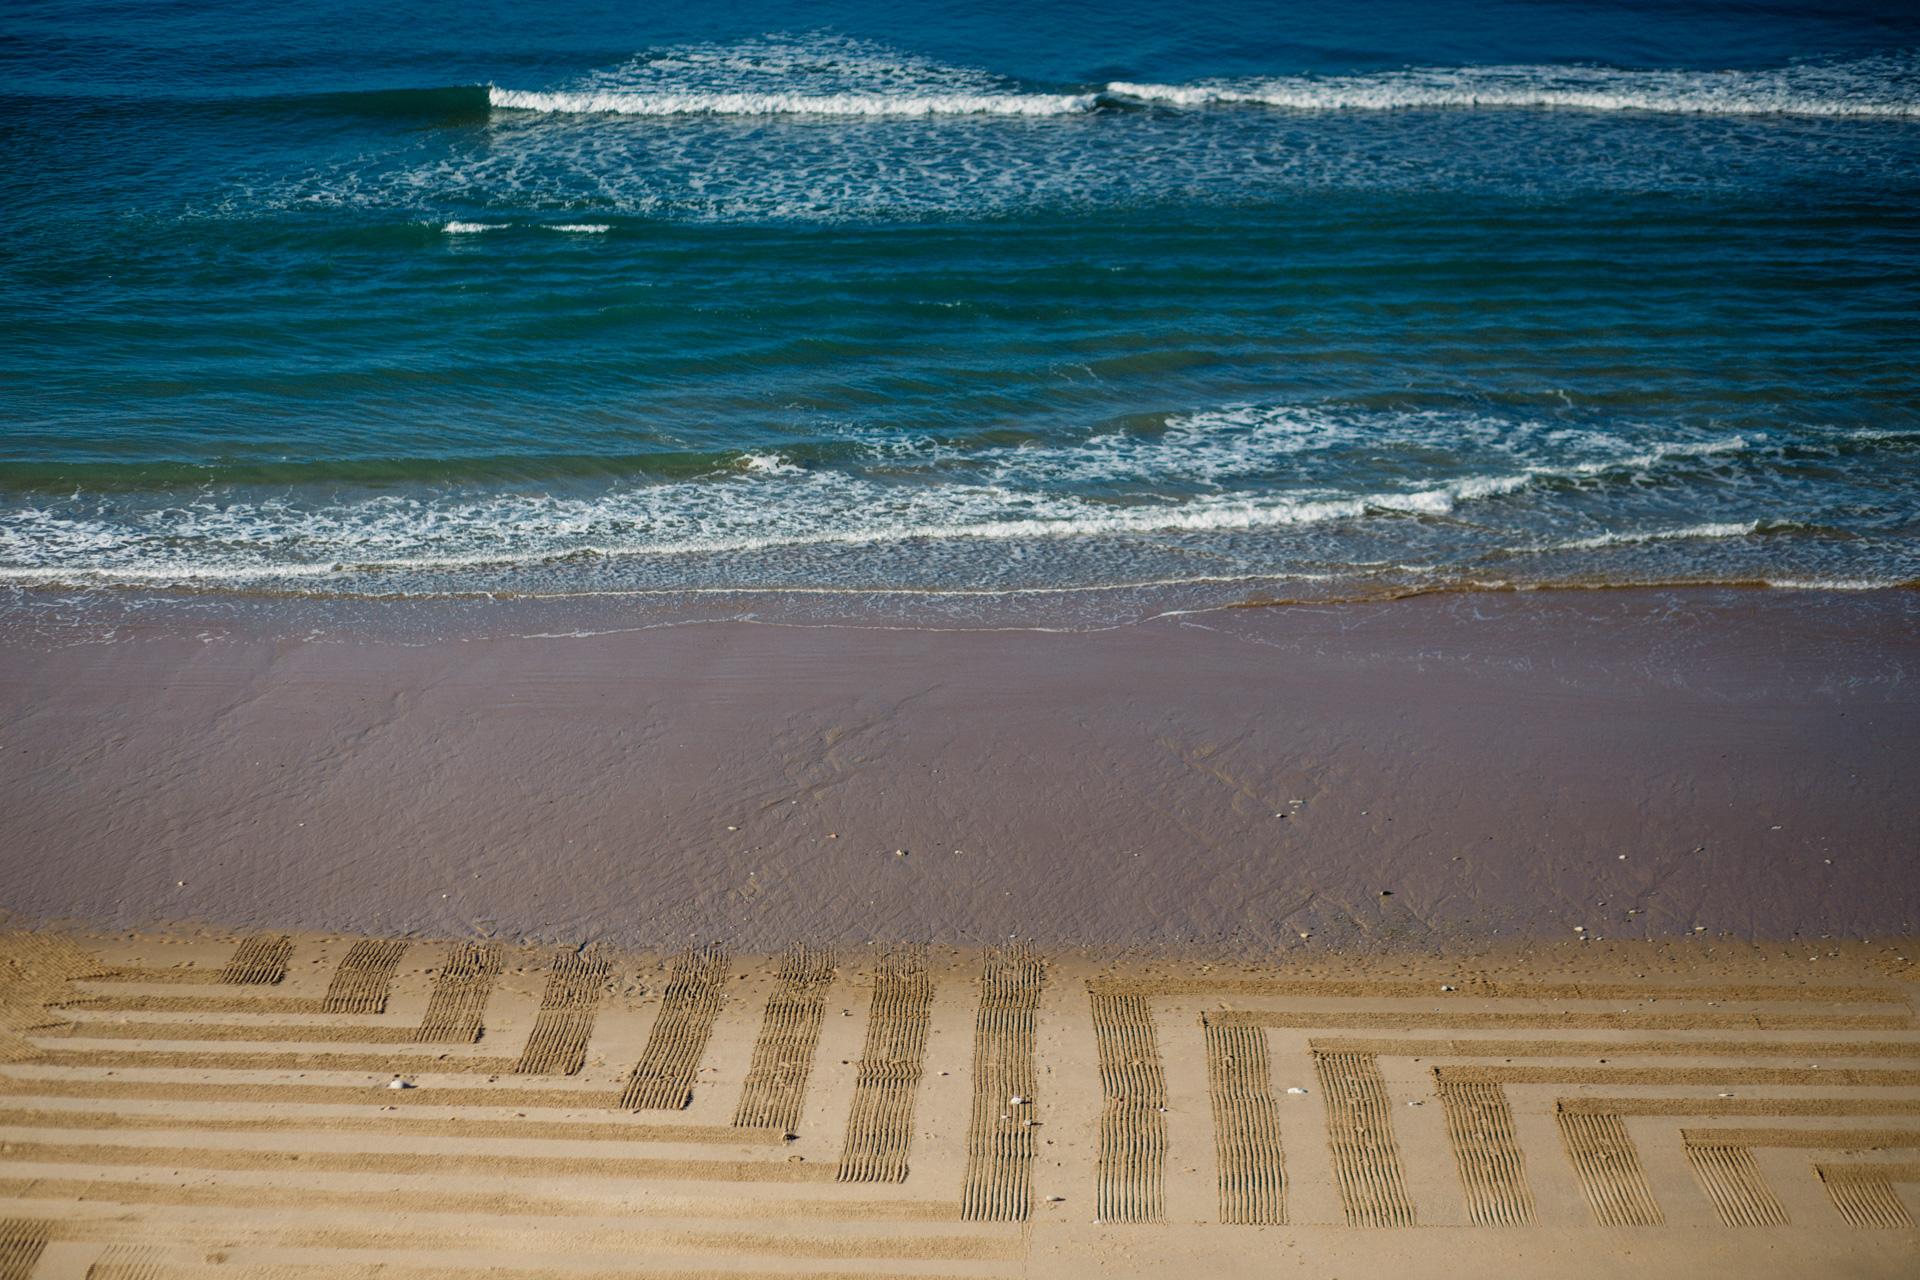 Damien-dohmen-sand-print-lx-one-18